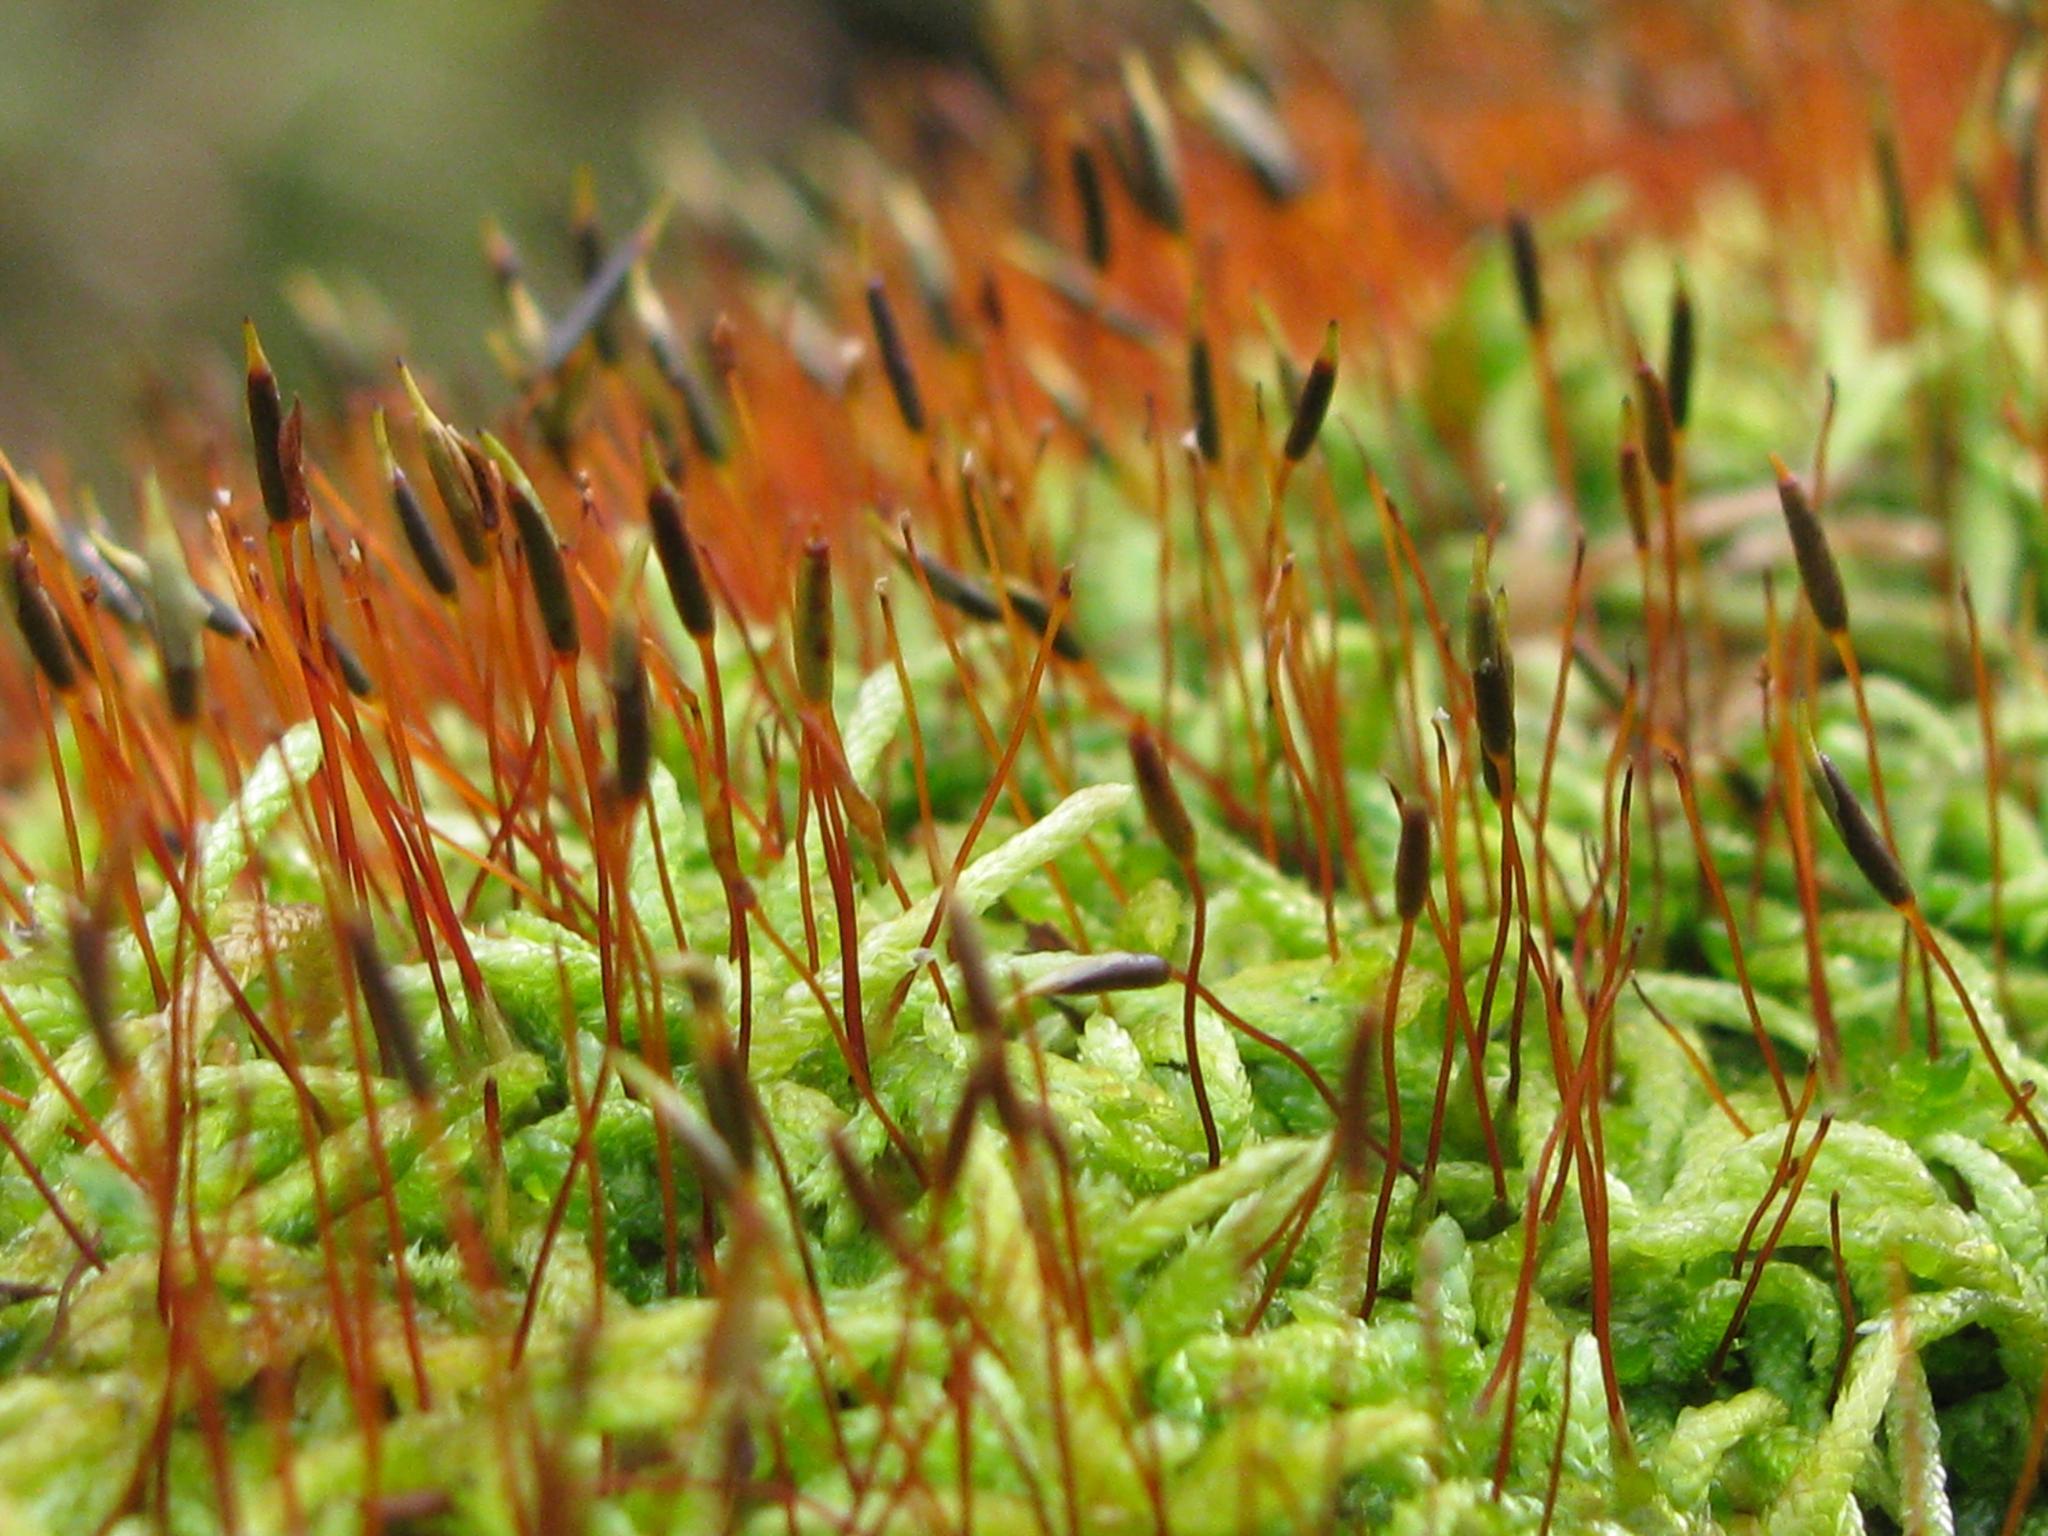 Club moss by caryllc